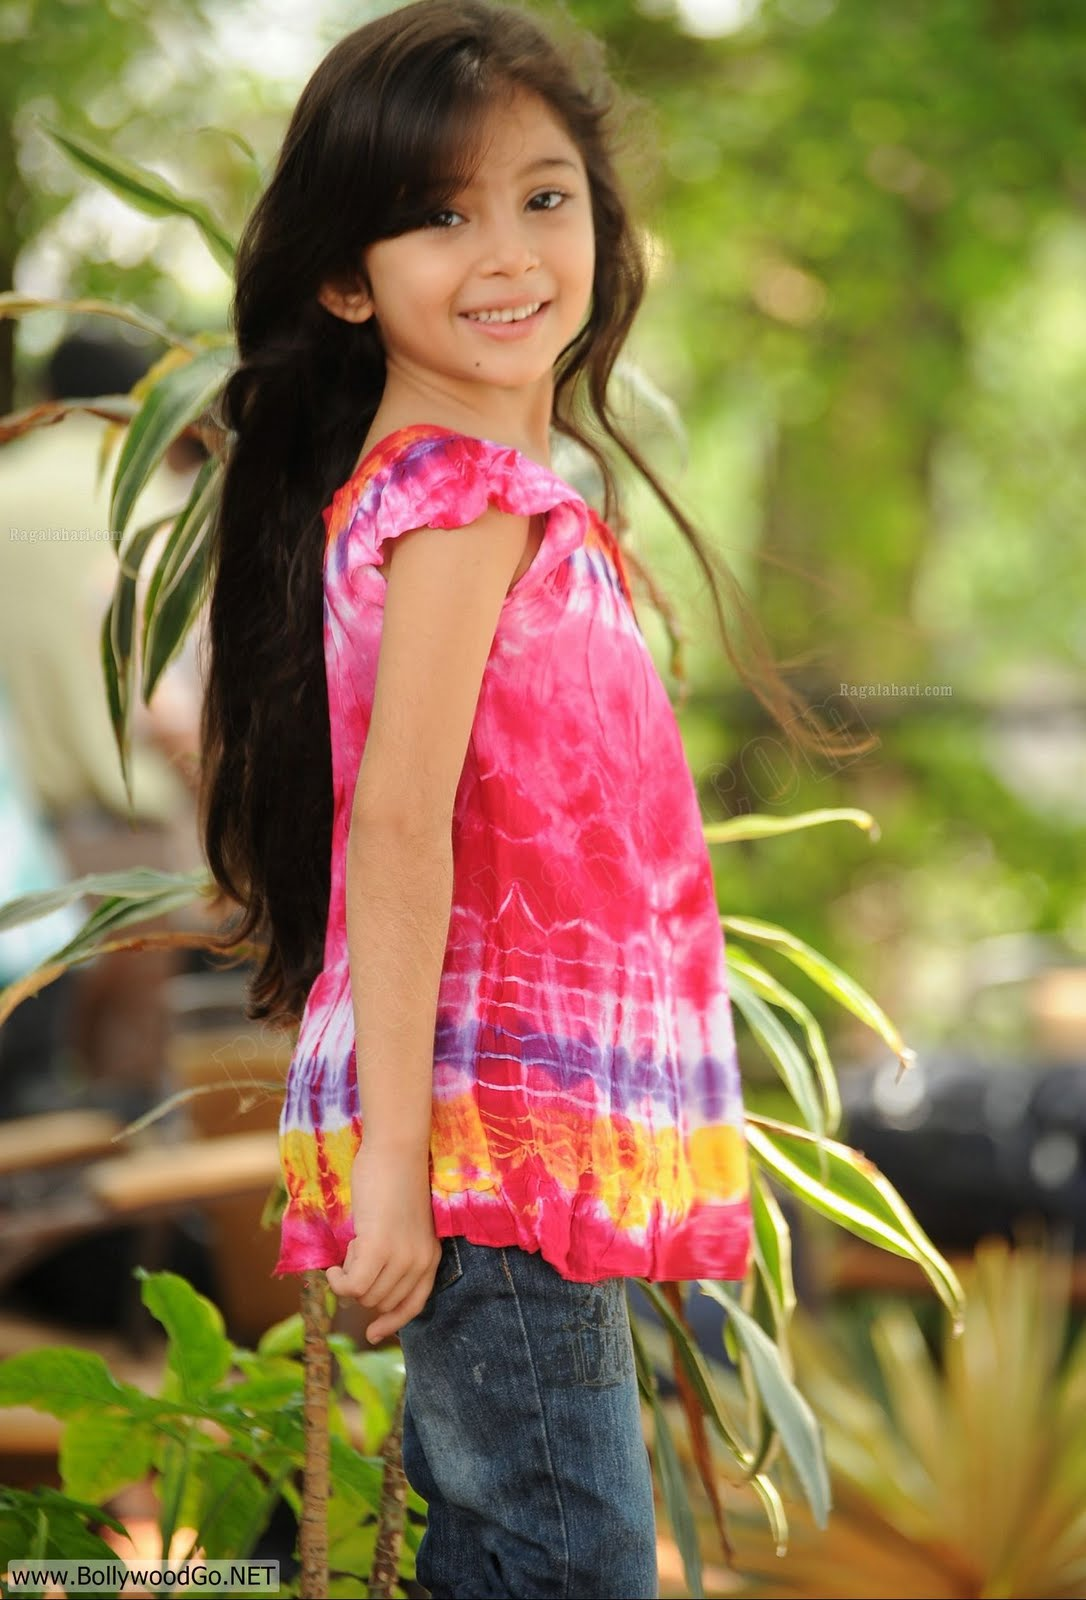 Wallpaper Of Little Girl In Bajrangi Bhaijaan Wallpapers Gallery Sara Arjun Beautiful Child Actress